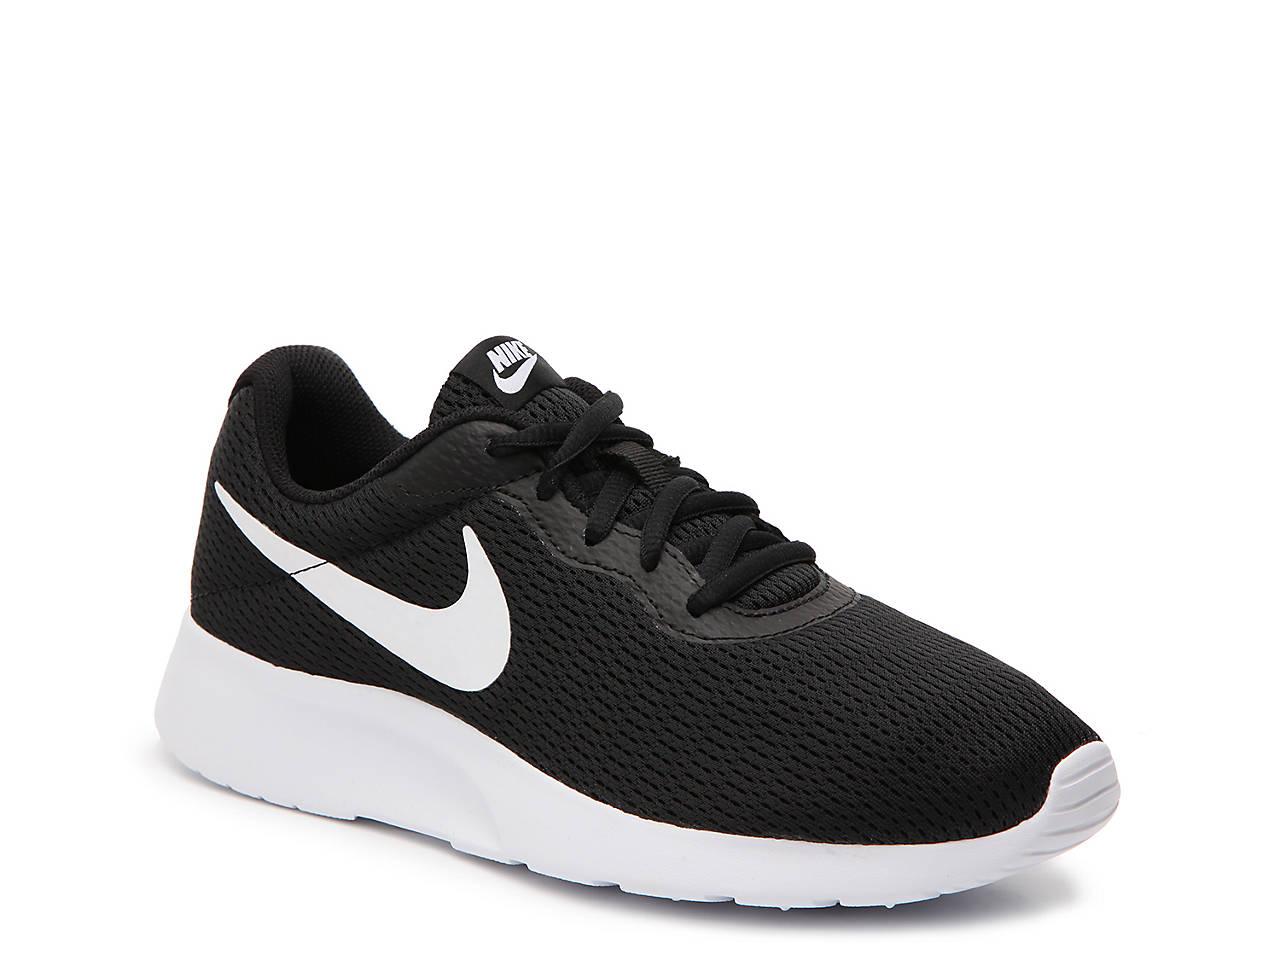 meilleure sélection 3eb5c 084e3 Tanjun Sneaker - Women's